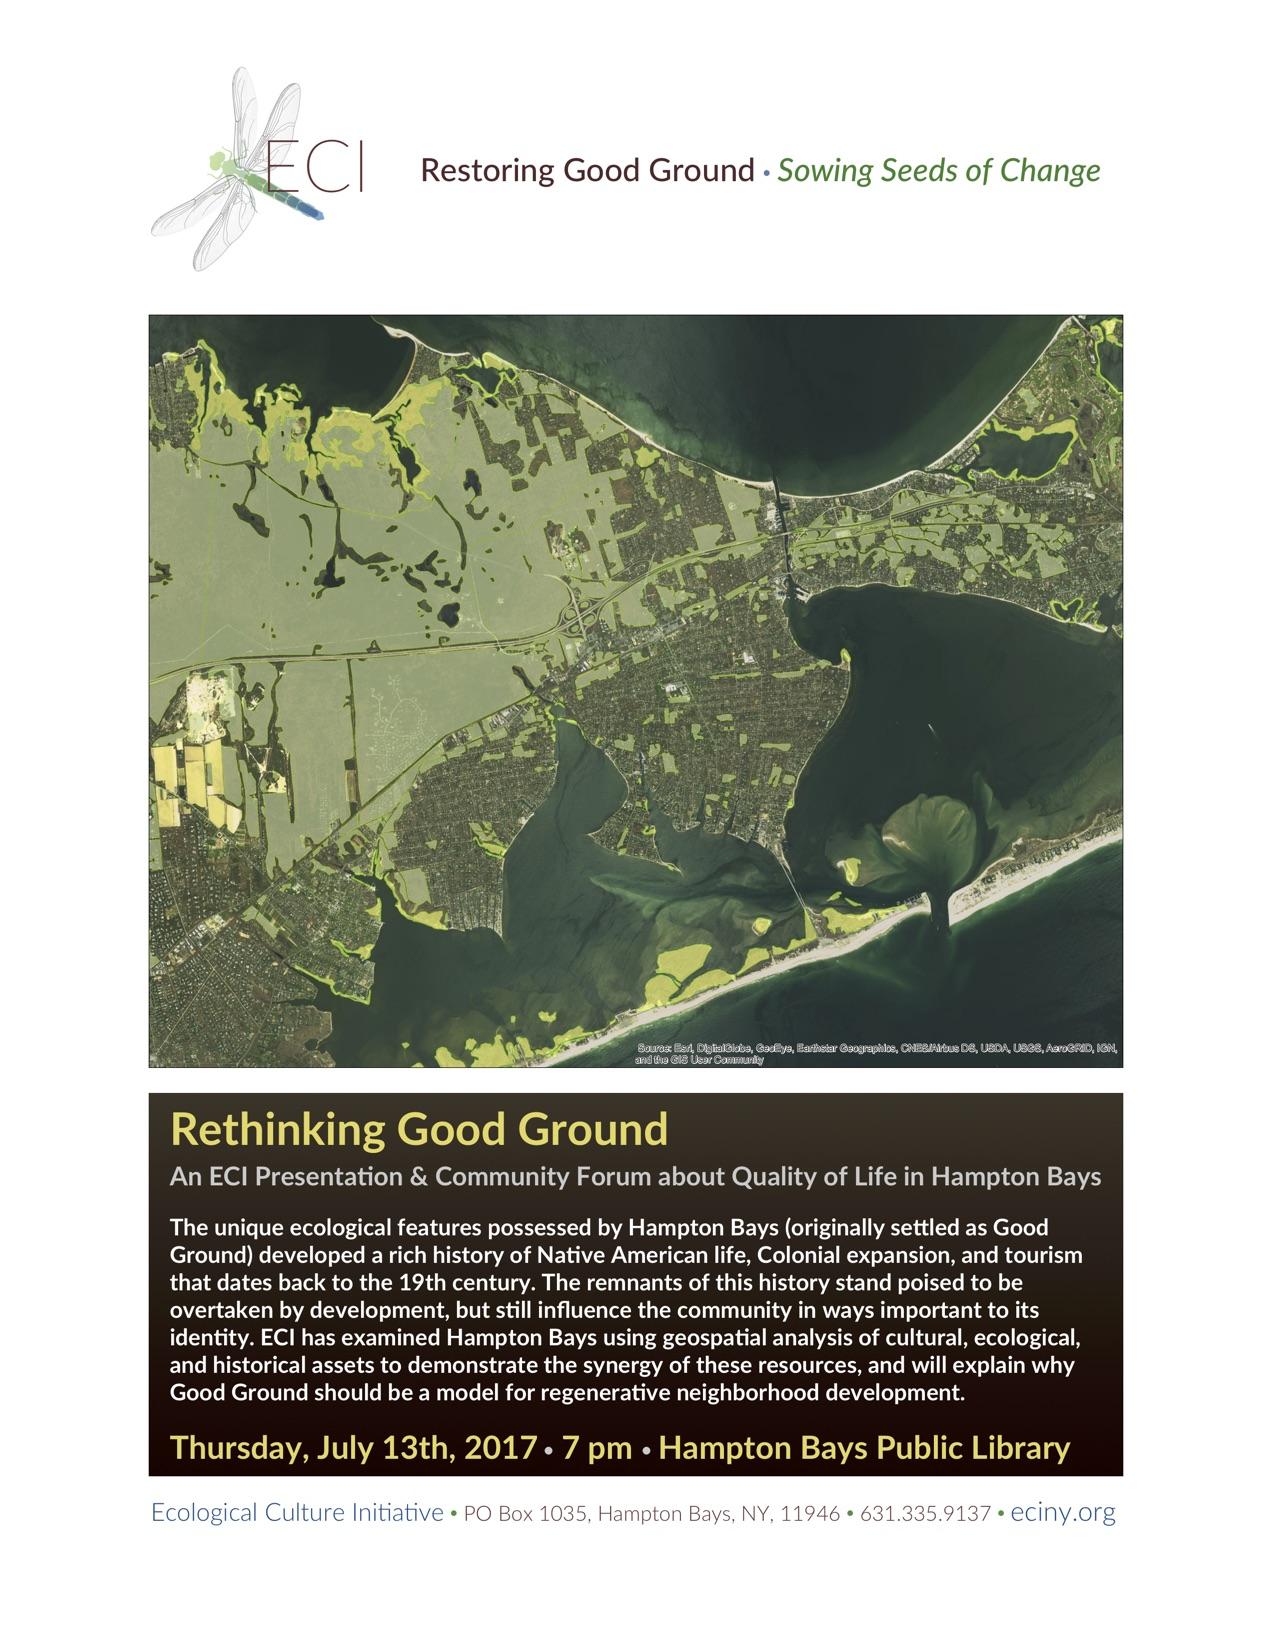 Rethinking Good Ground - July 13th, 2017 - 8.5x11 flyer.jpg